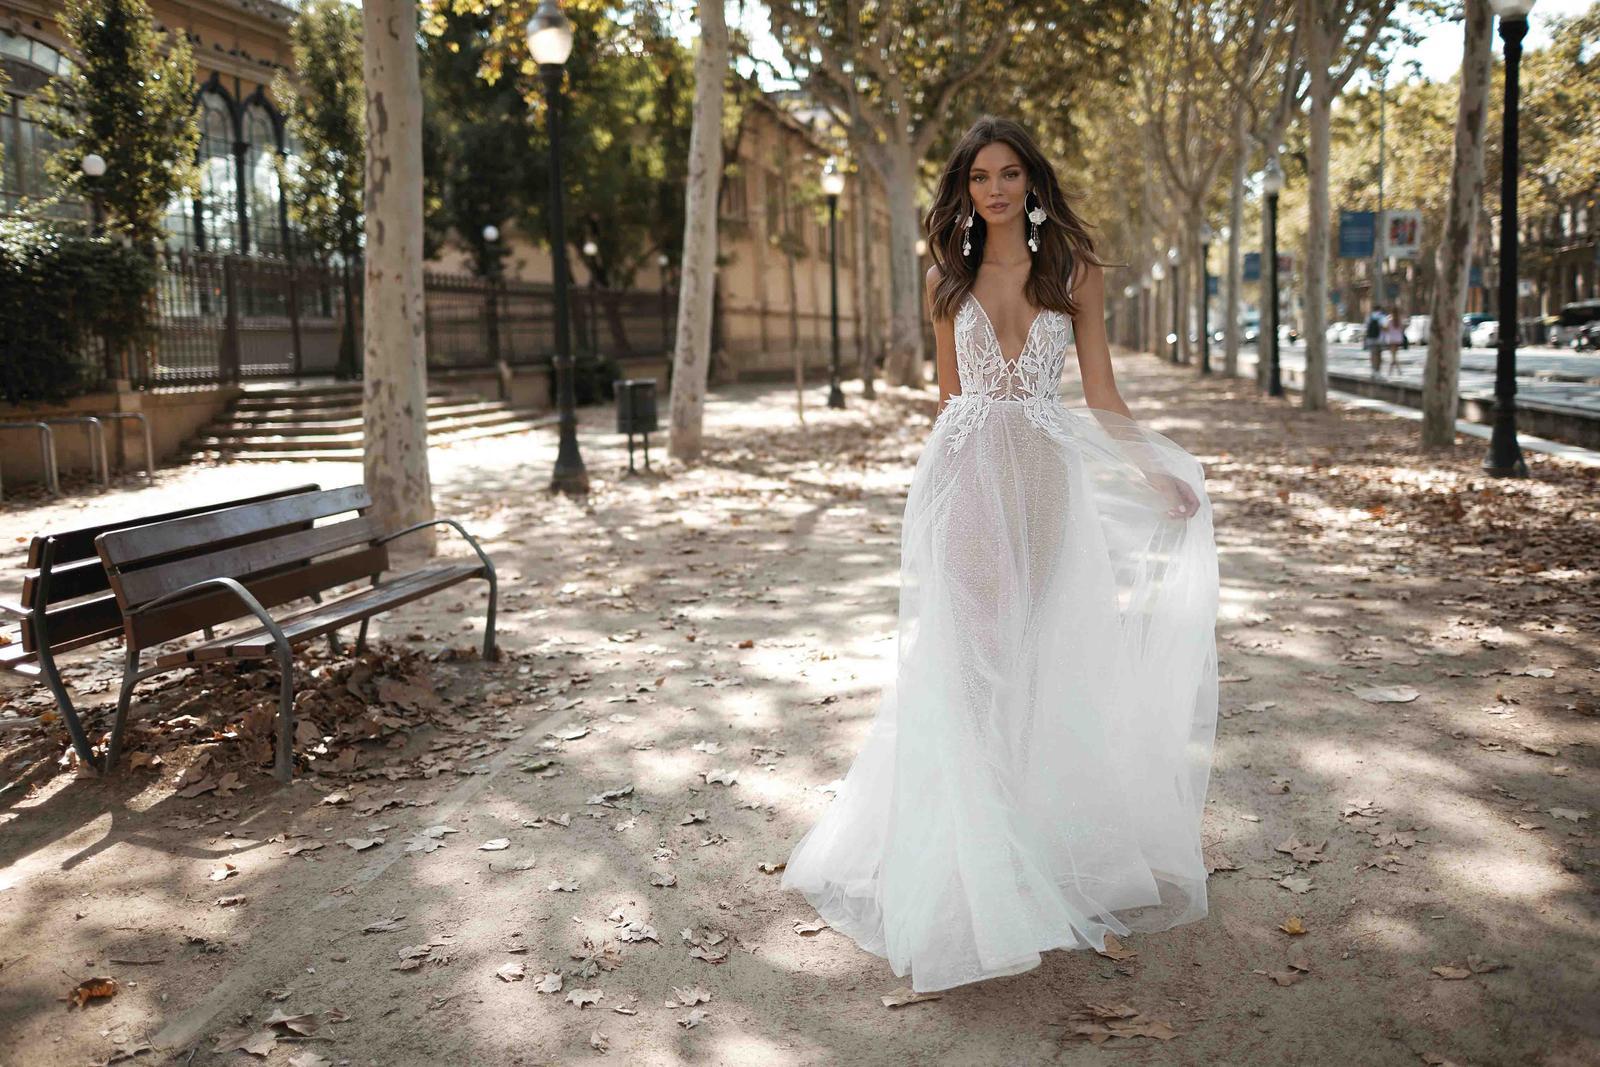 Muse by Berta * Svadobné šaty z kolekcií na rok 2019 - Obrázok č. 35